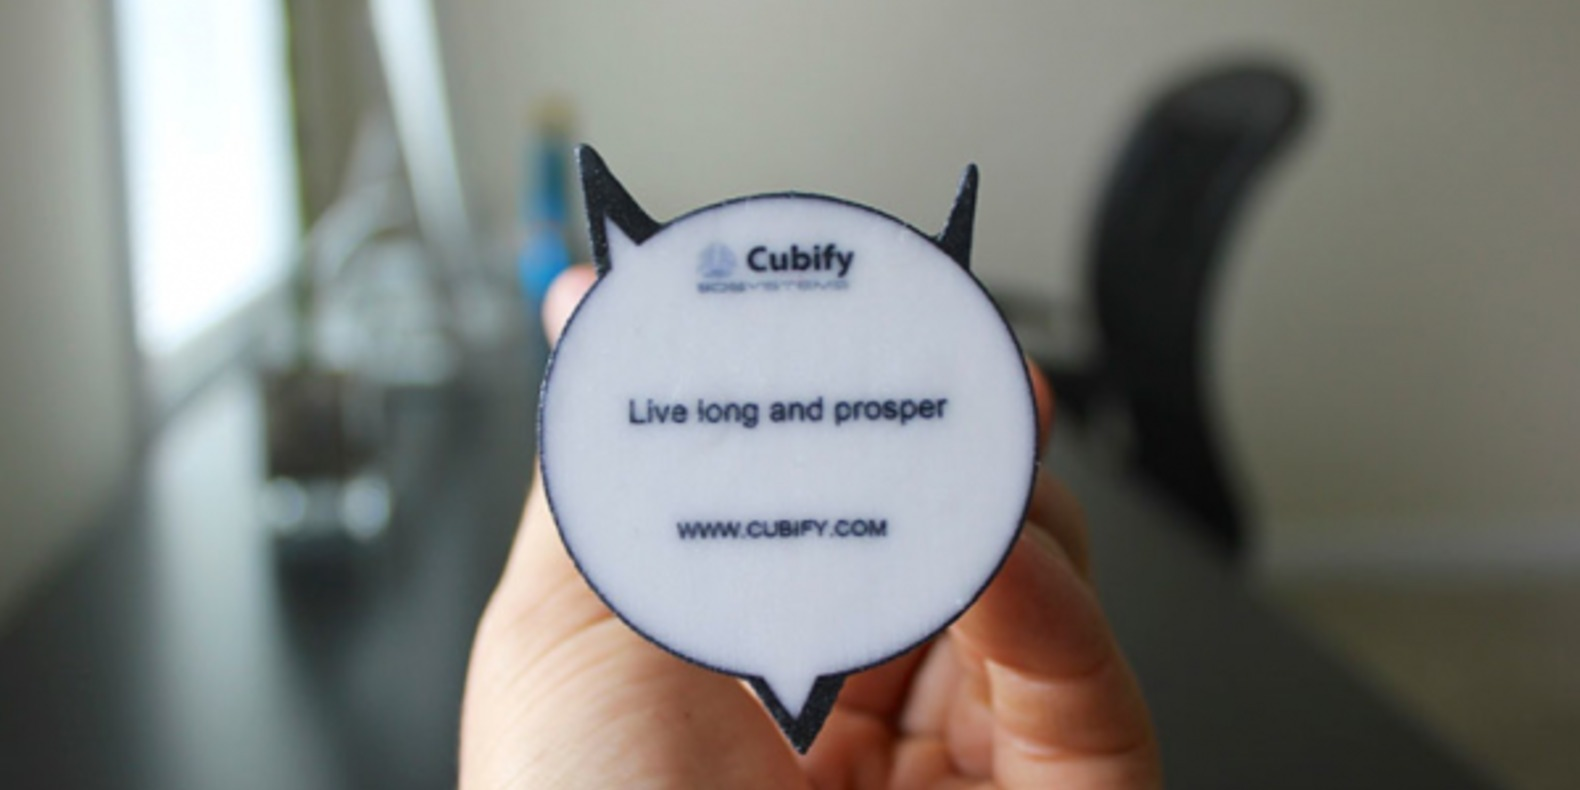 cubify 3D systems star trek 3DME impression 3D fugurines personnalisation cults fichier 3D 4